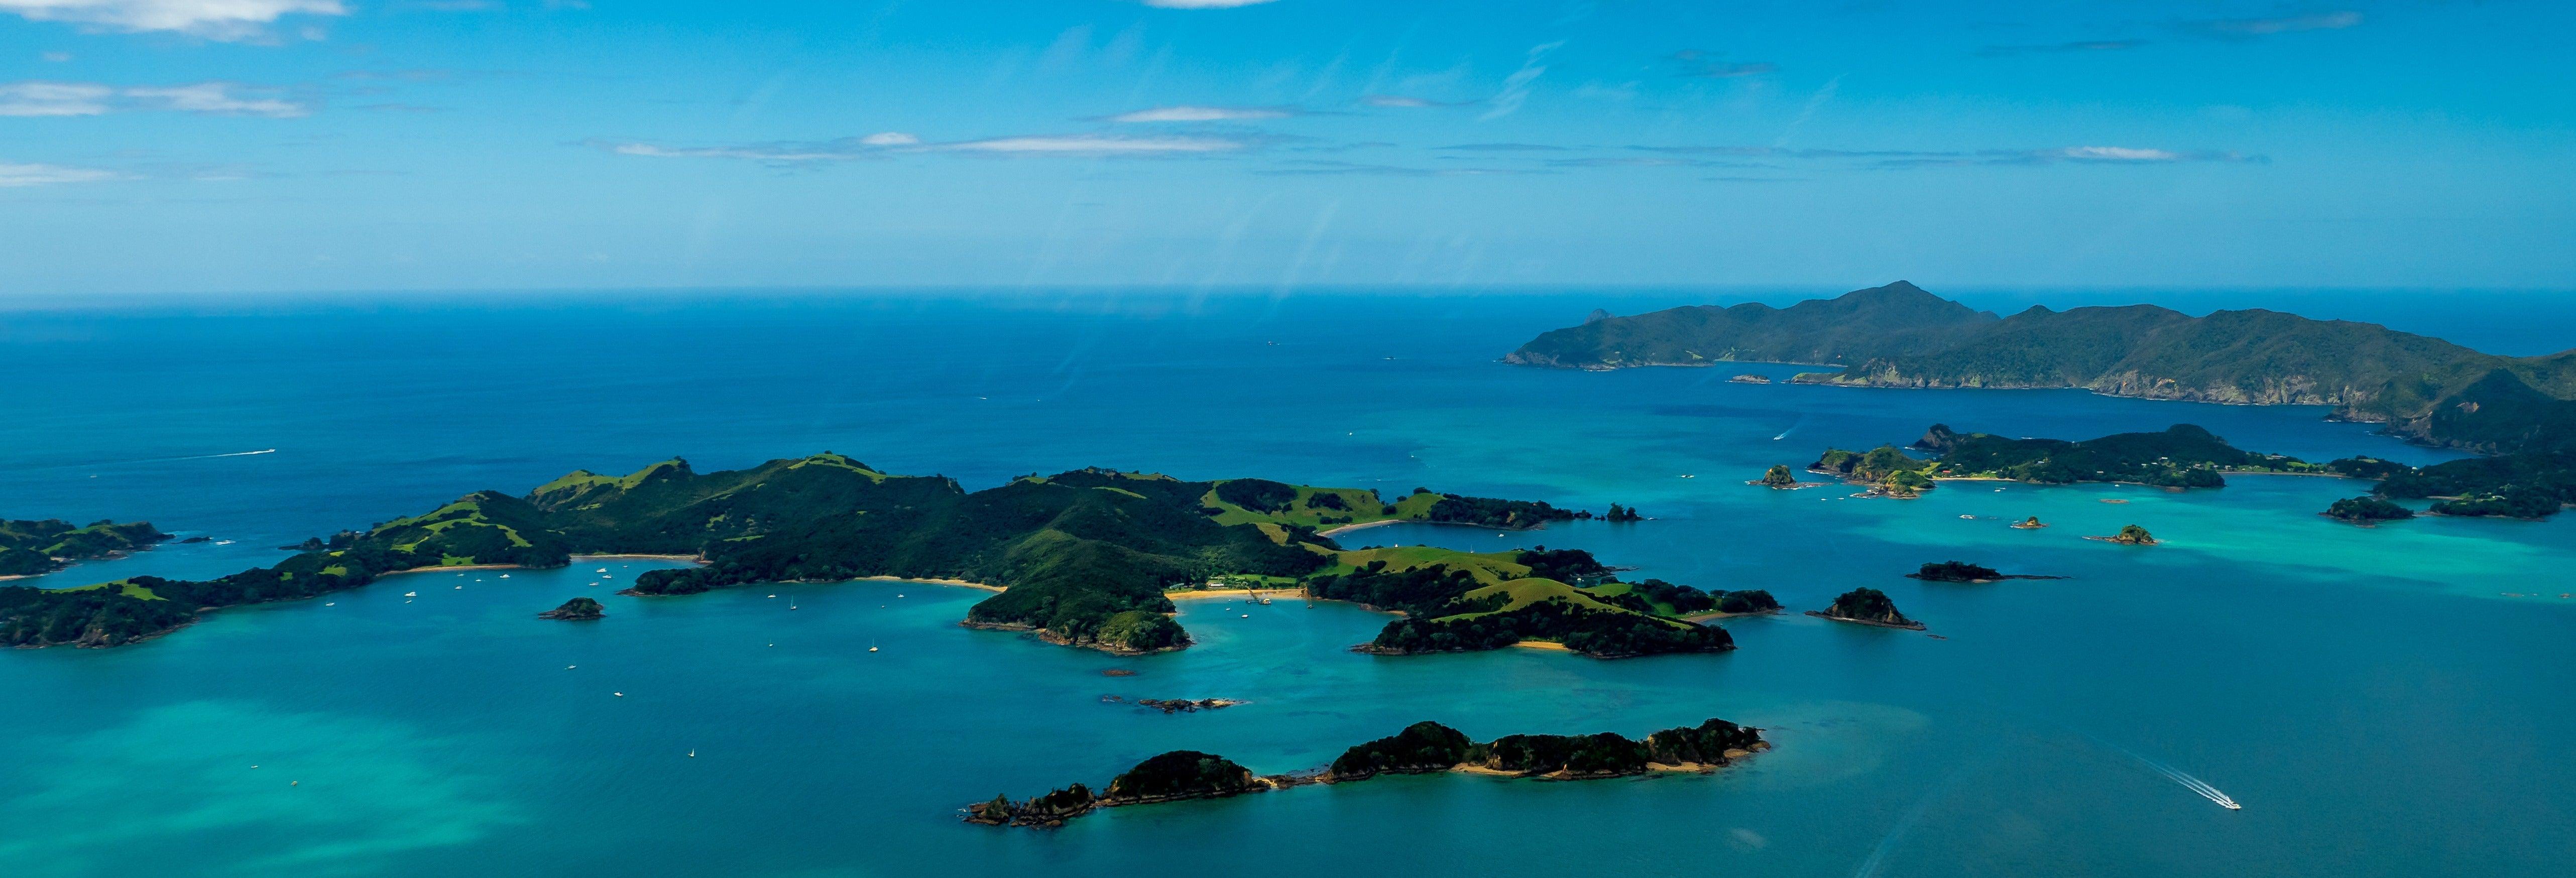 Tour de catamarã pela Baía das Ilhas